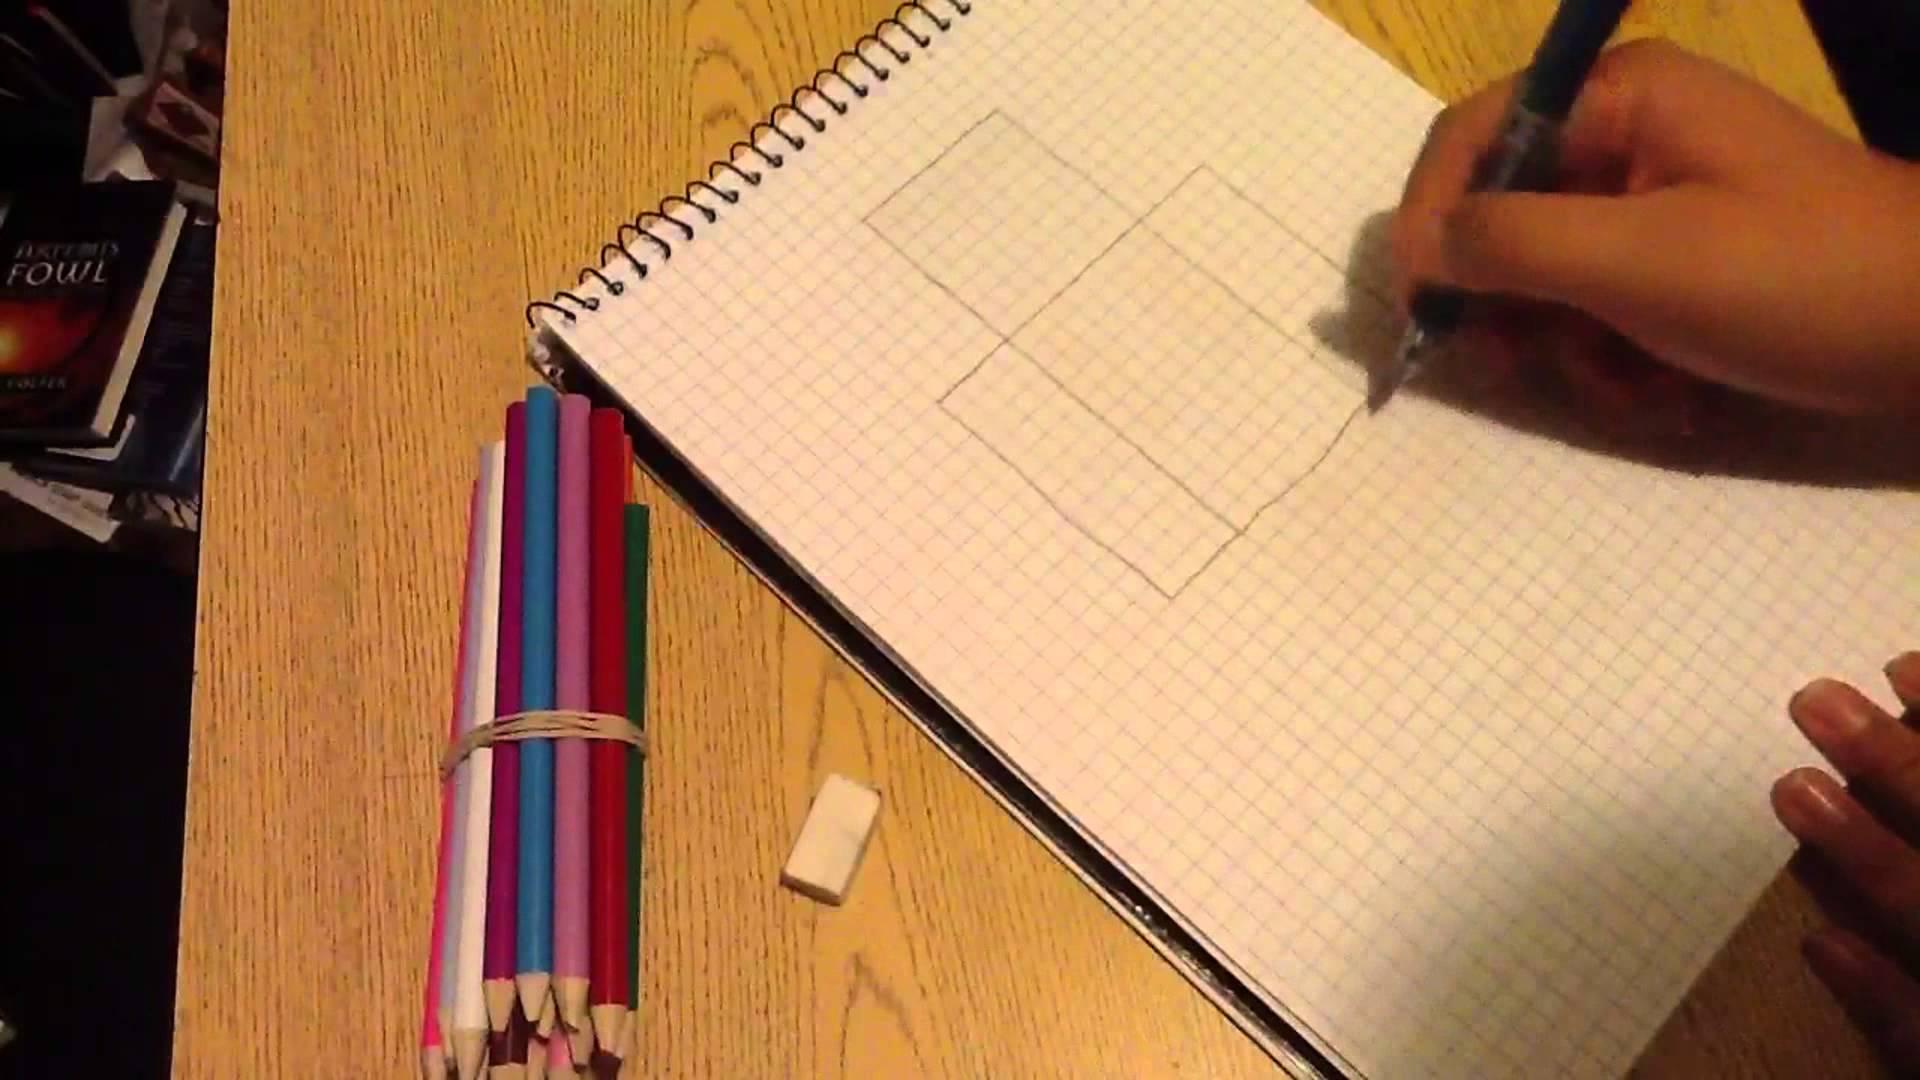 1920x1080 How To Draw Minecraft Skins(Monday)